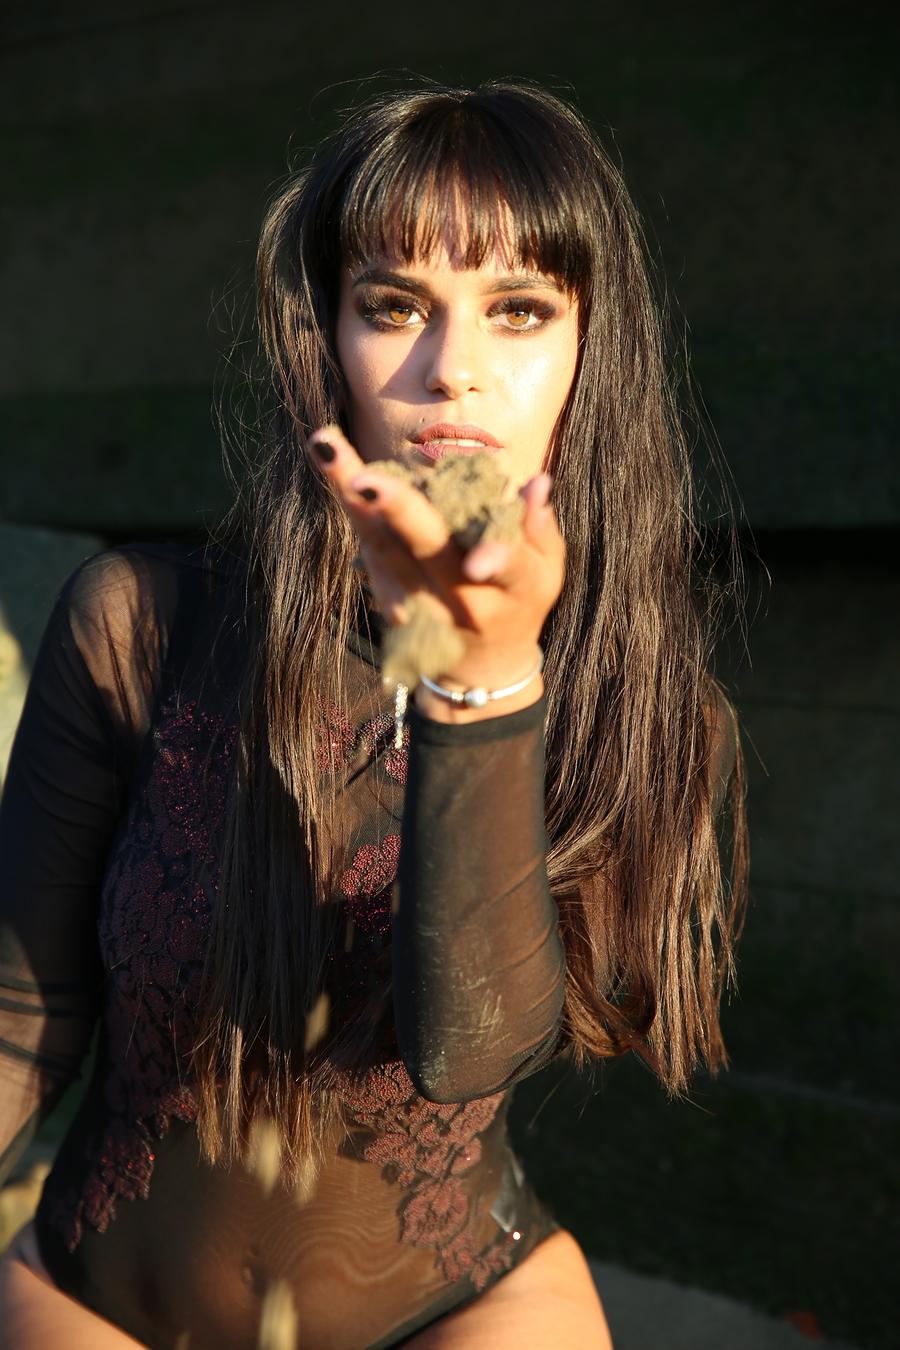 Miss hand / Model Georgiana1 / Uploaded 23rd June 2020 @ 10:11 PM